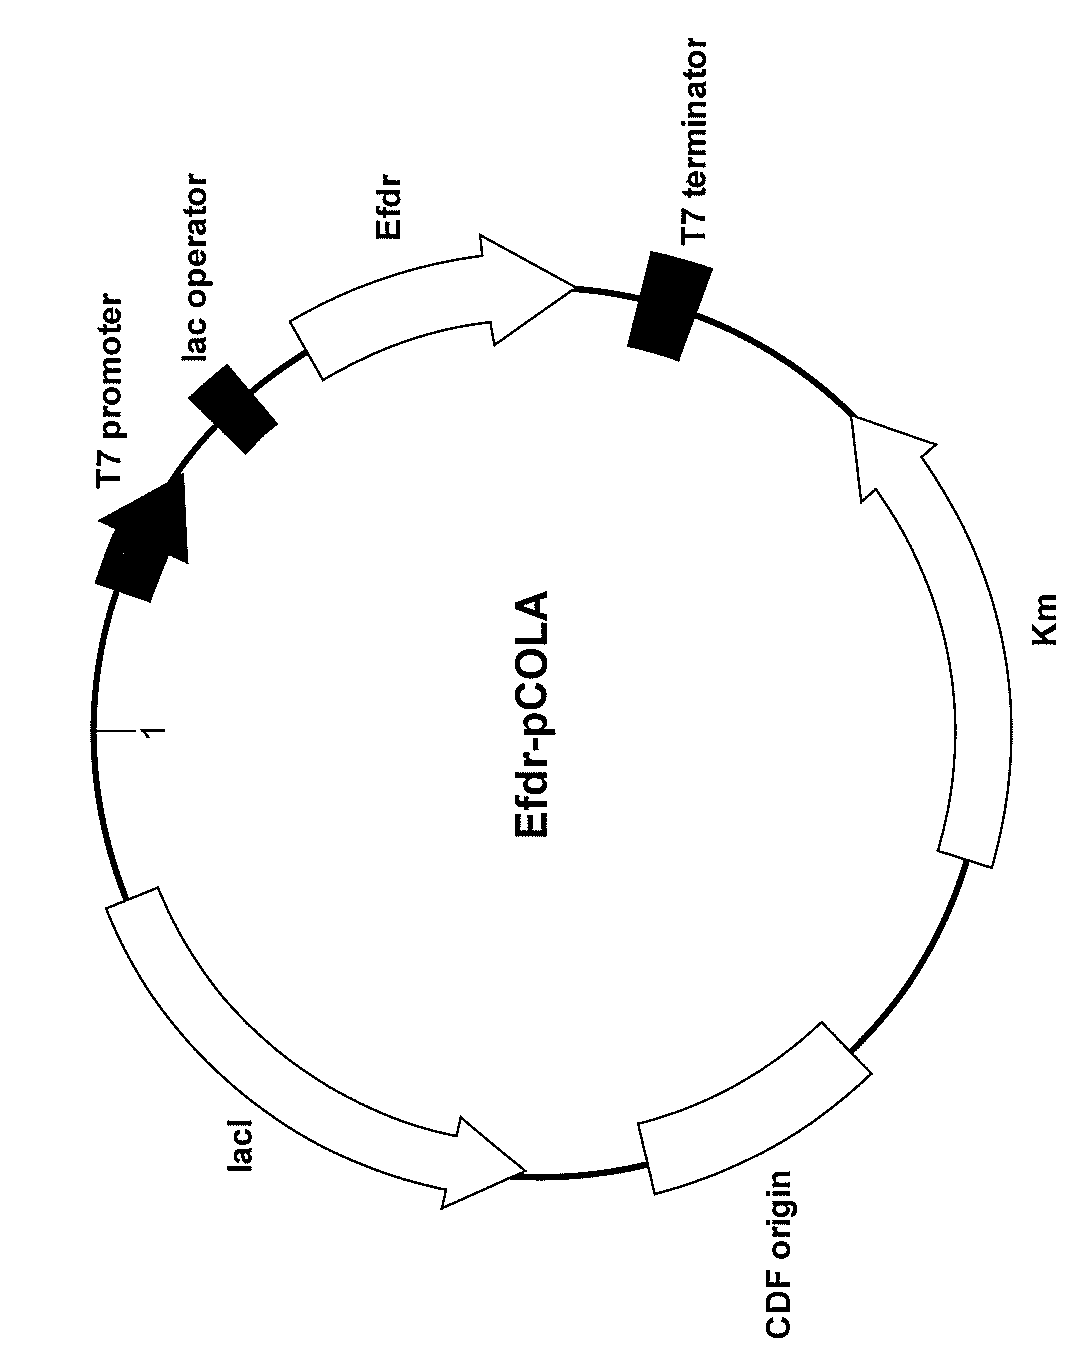 WO2013024527A1 - アルカンの製造方法及びアルカン合成能を有する組換え微生物         - Google PatentsFamily